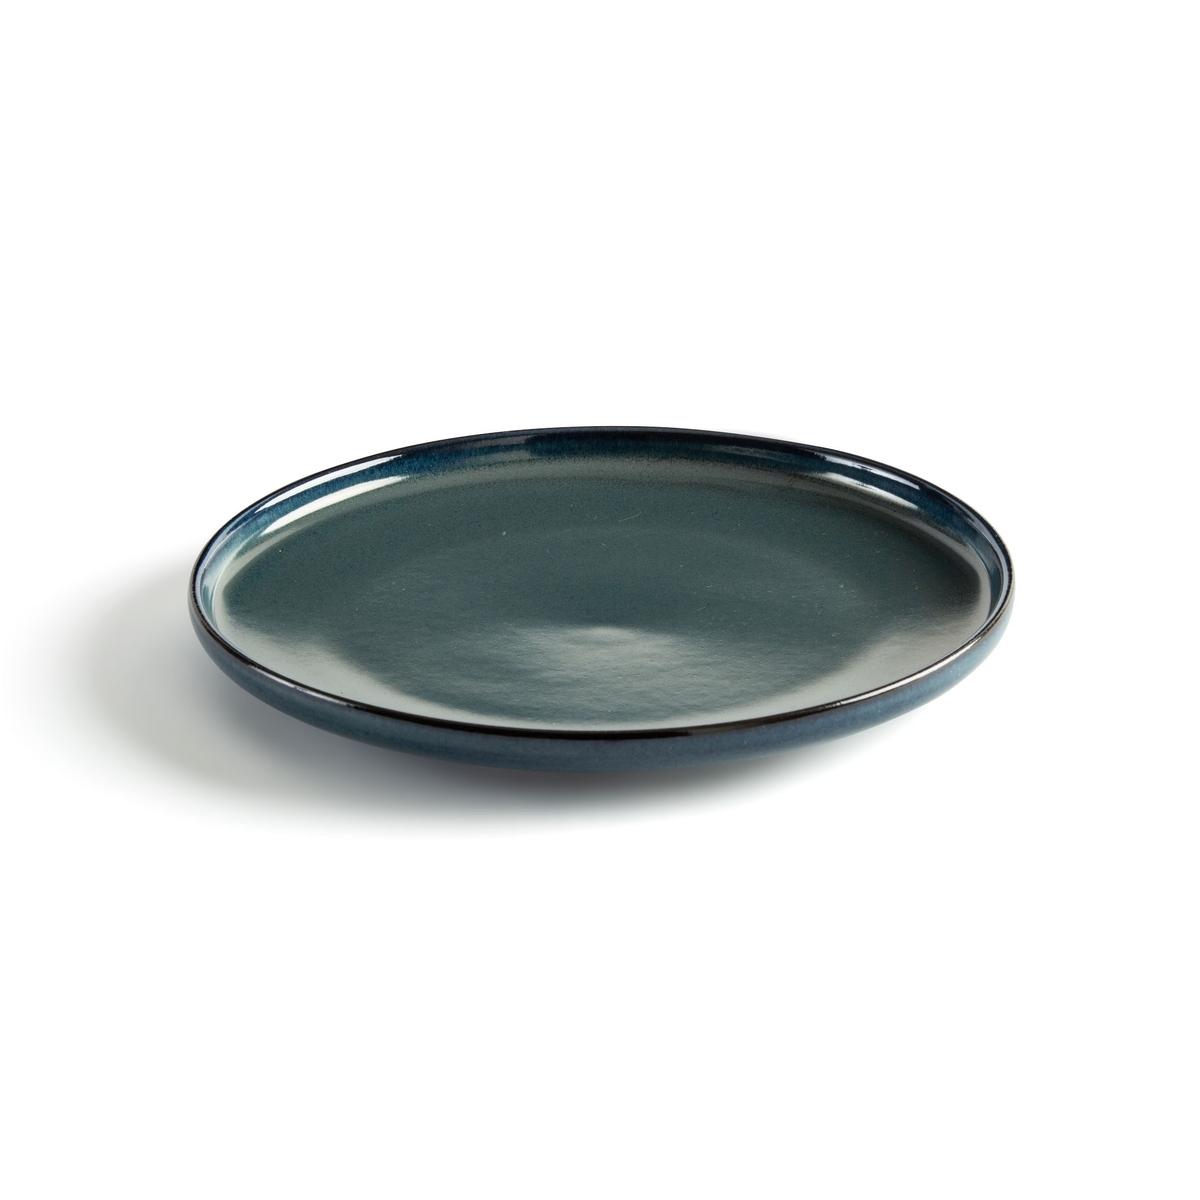 Akira Enamelled Stoneware Dessert Plates (Set of 4)